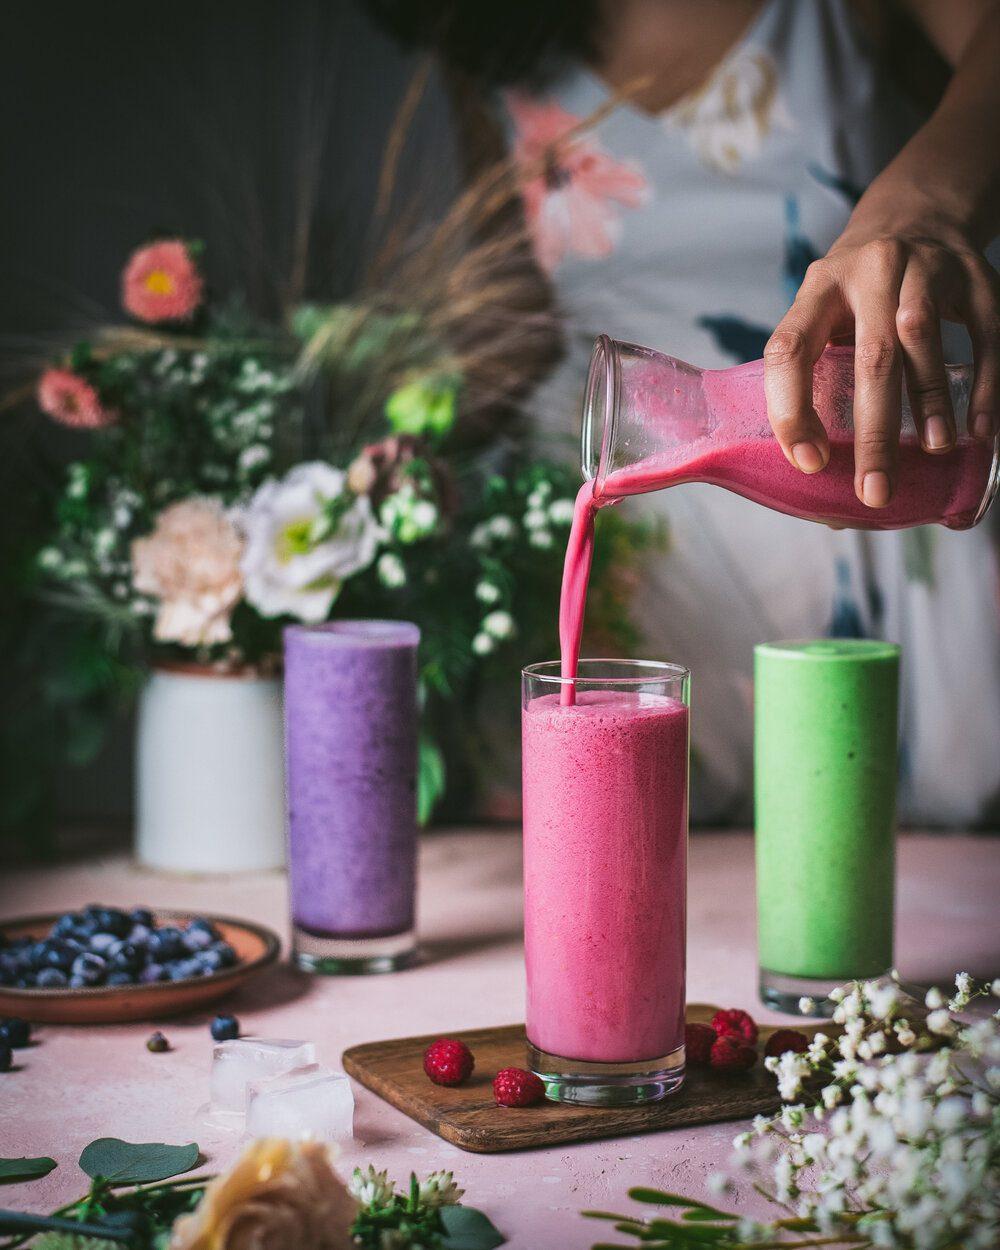 10 Easy Vegan Breakfast Ideas. Vegan Smoothies. smoothies food photography.